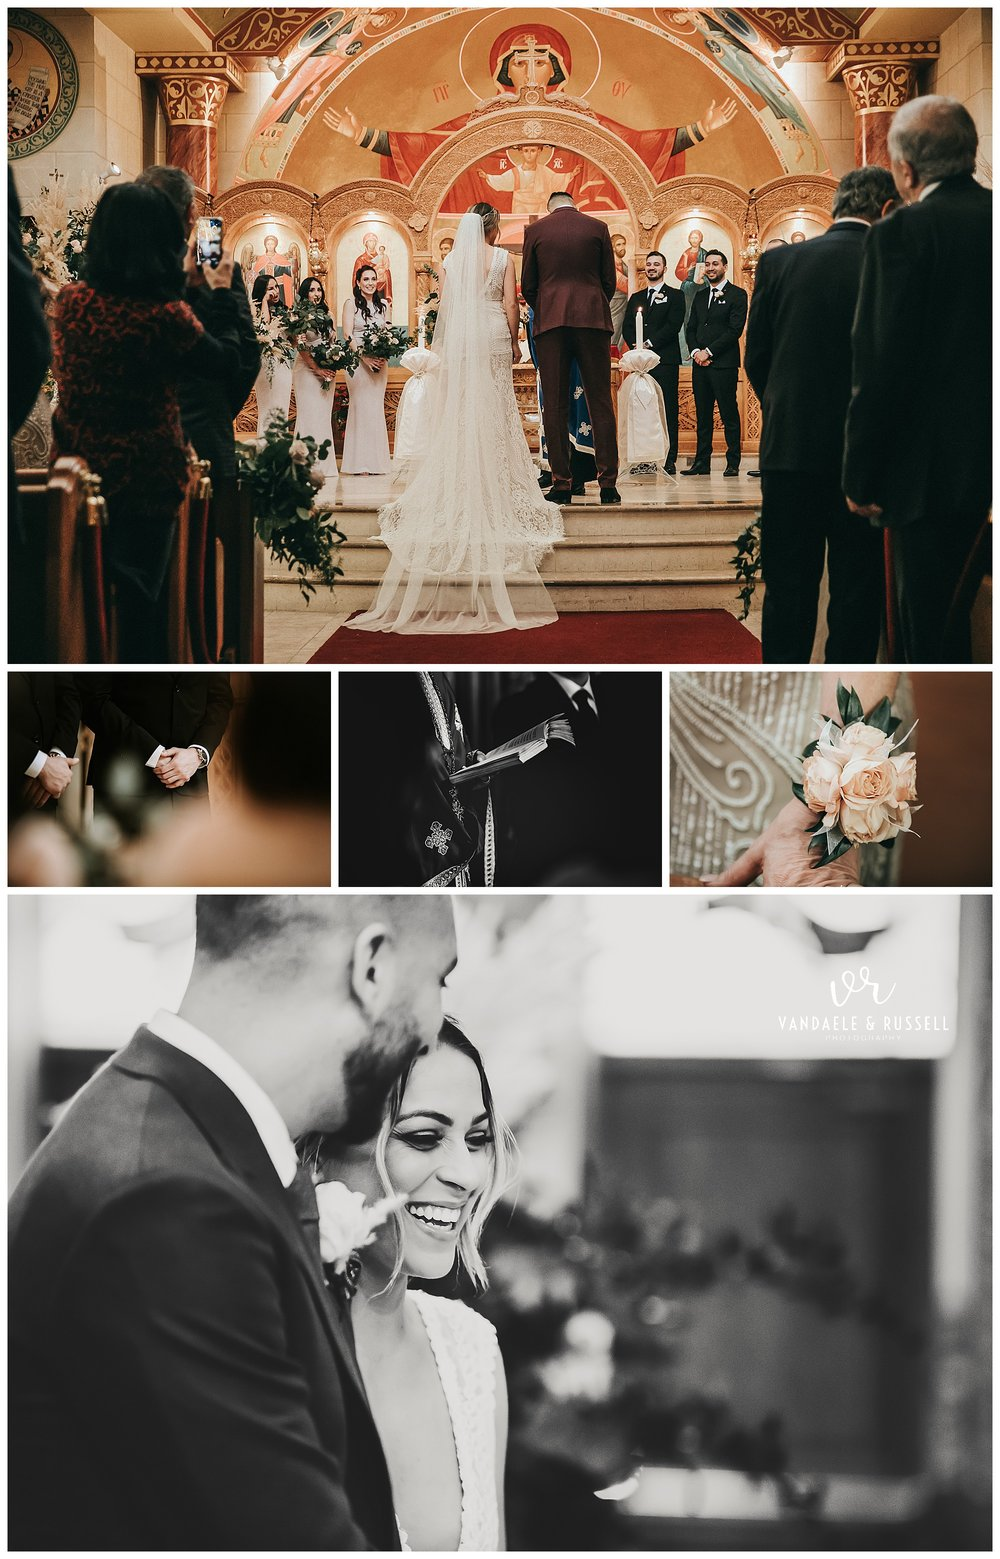 Joanna-Christos-Grand-Luxe-Wedding-Photos-Mint-Room-Toronto-VanDaele-Russell_0073.jpg